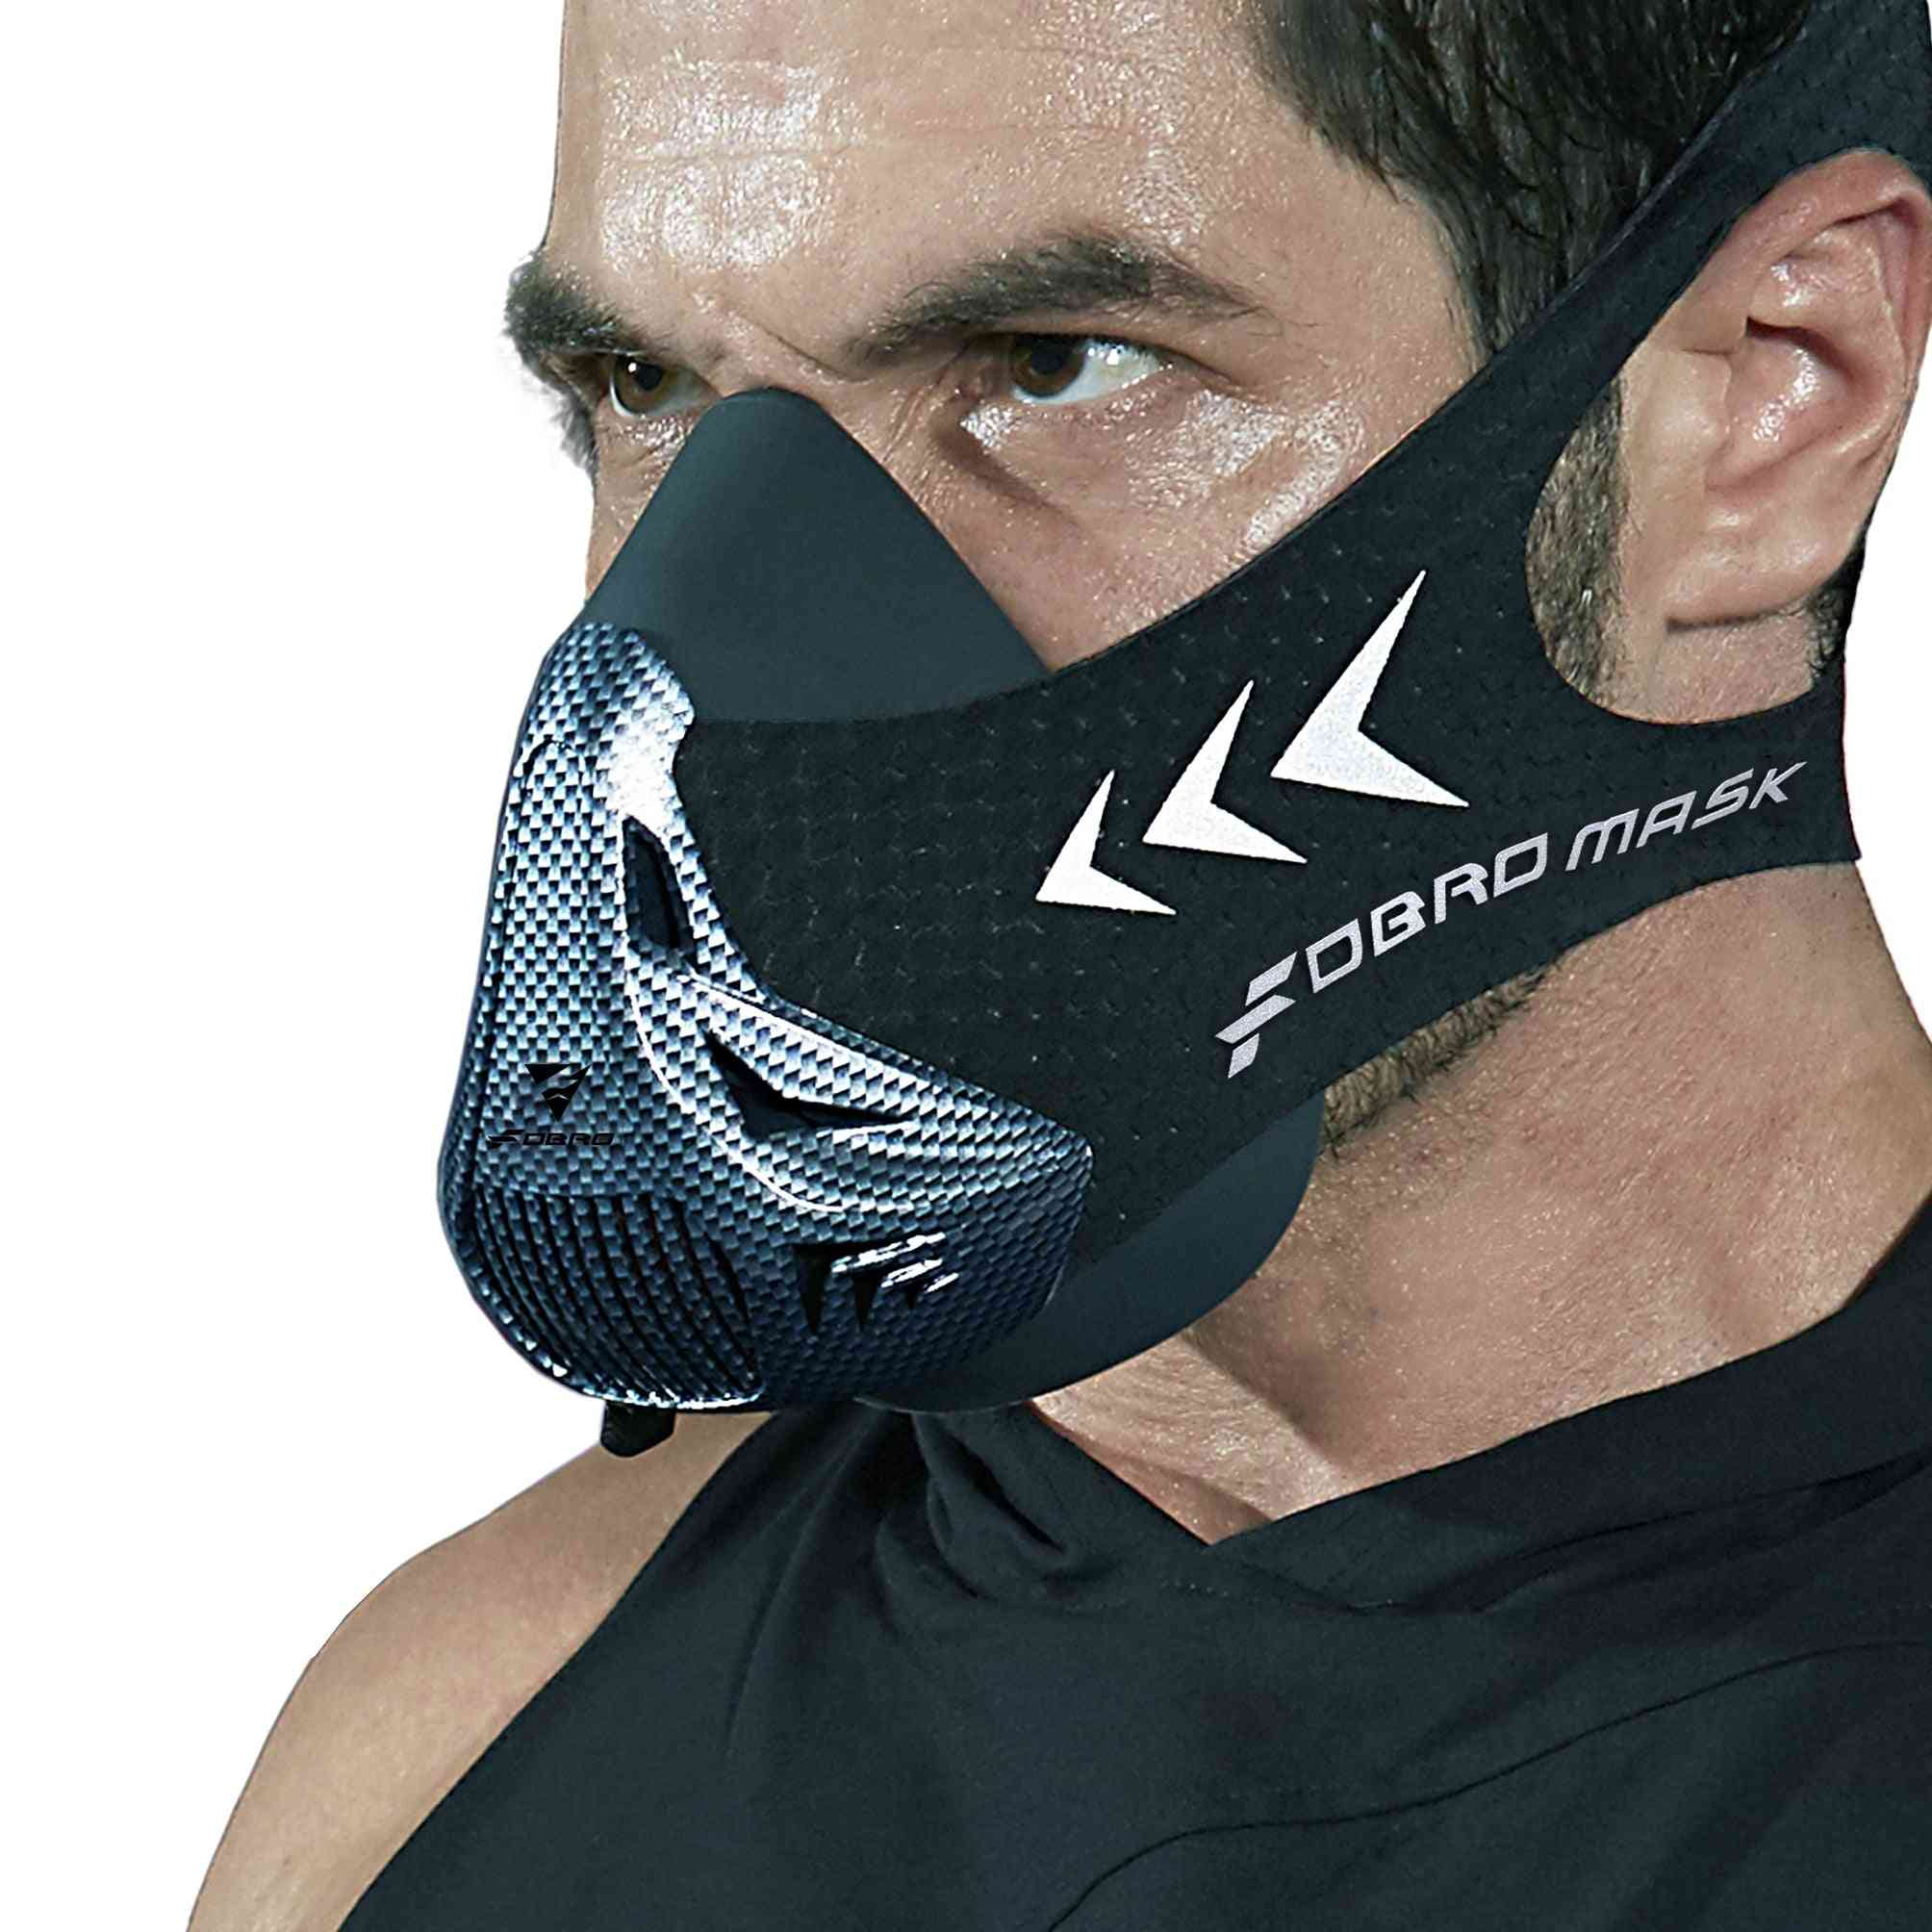 Fdbro Workout, Running Resistance, Elevation Cardio, Fitness Training, Sports Mask